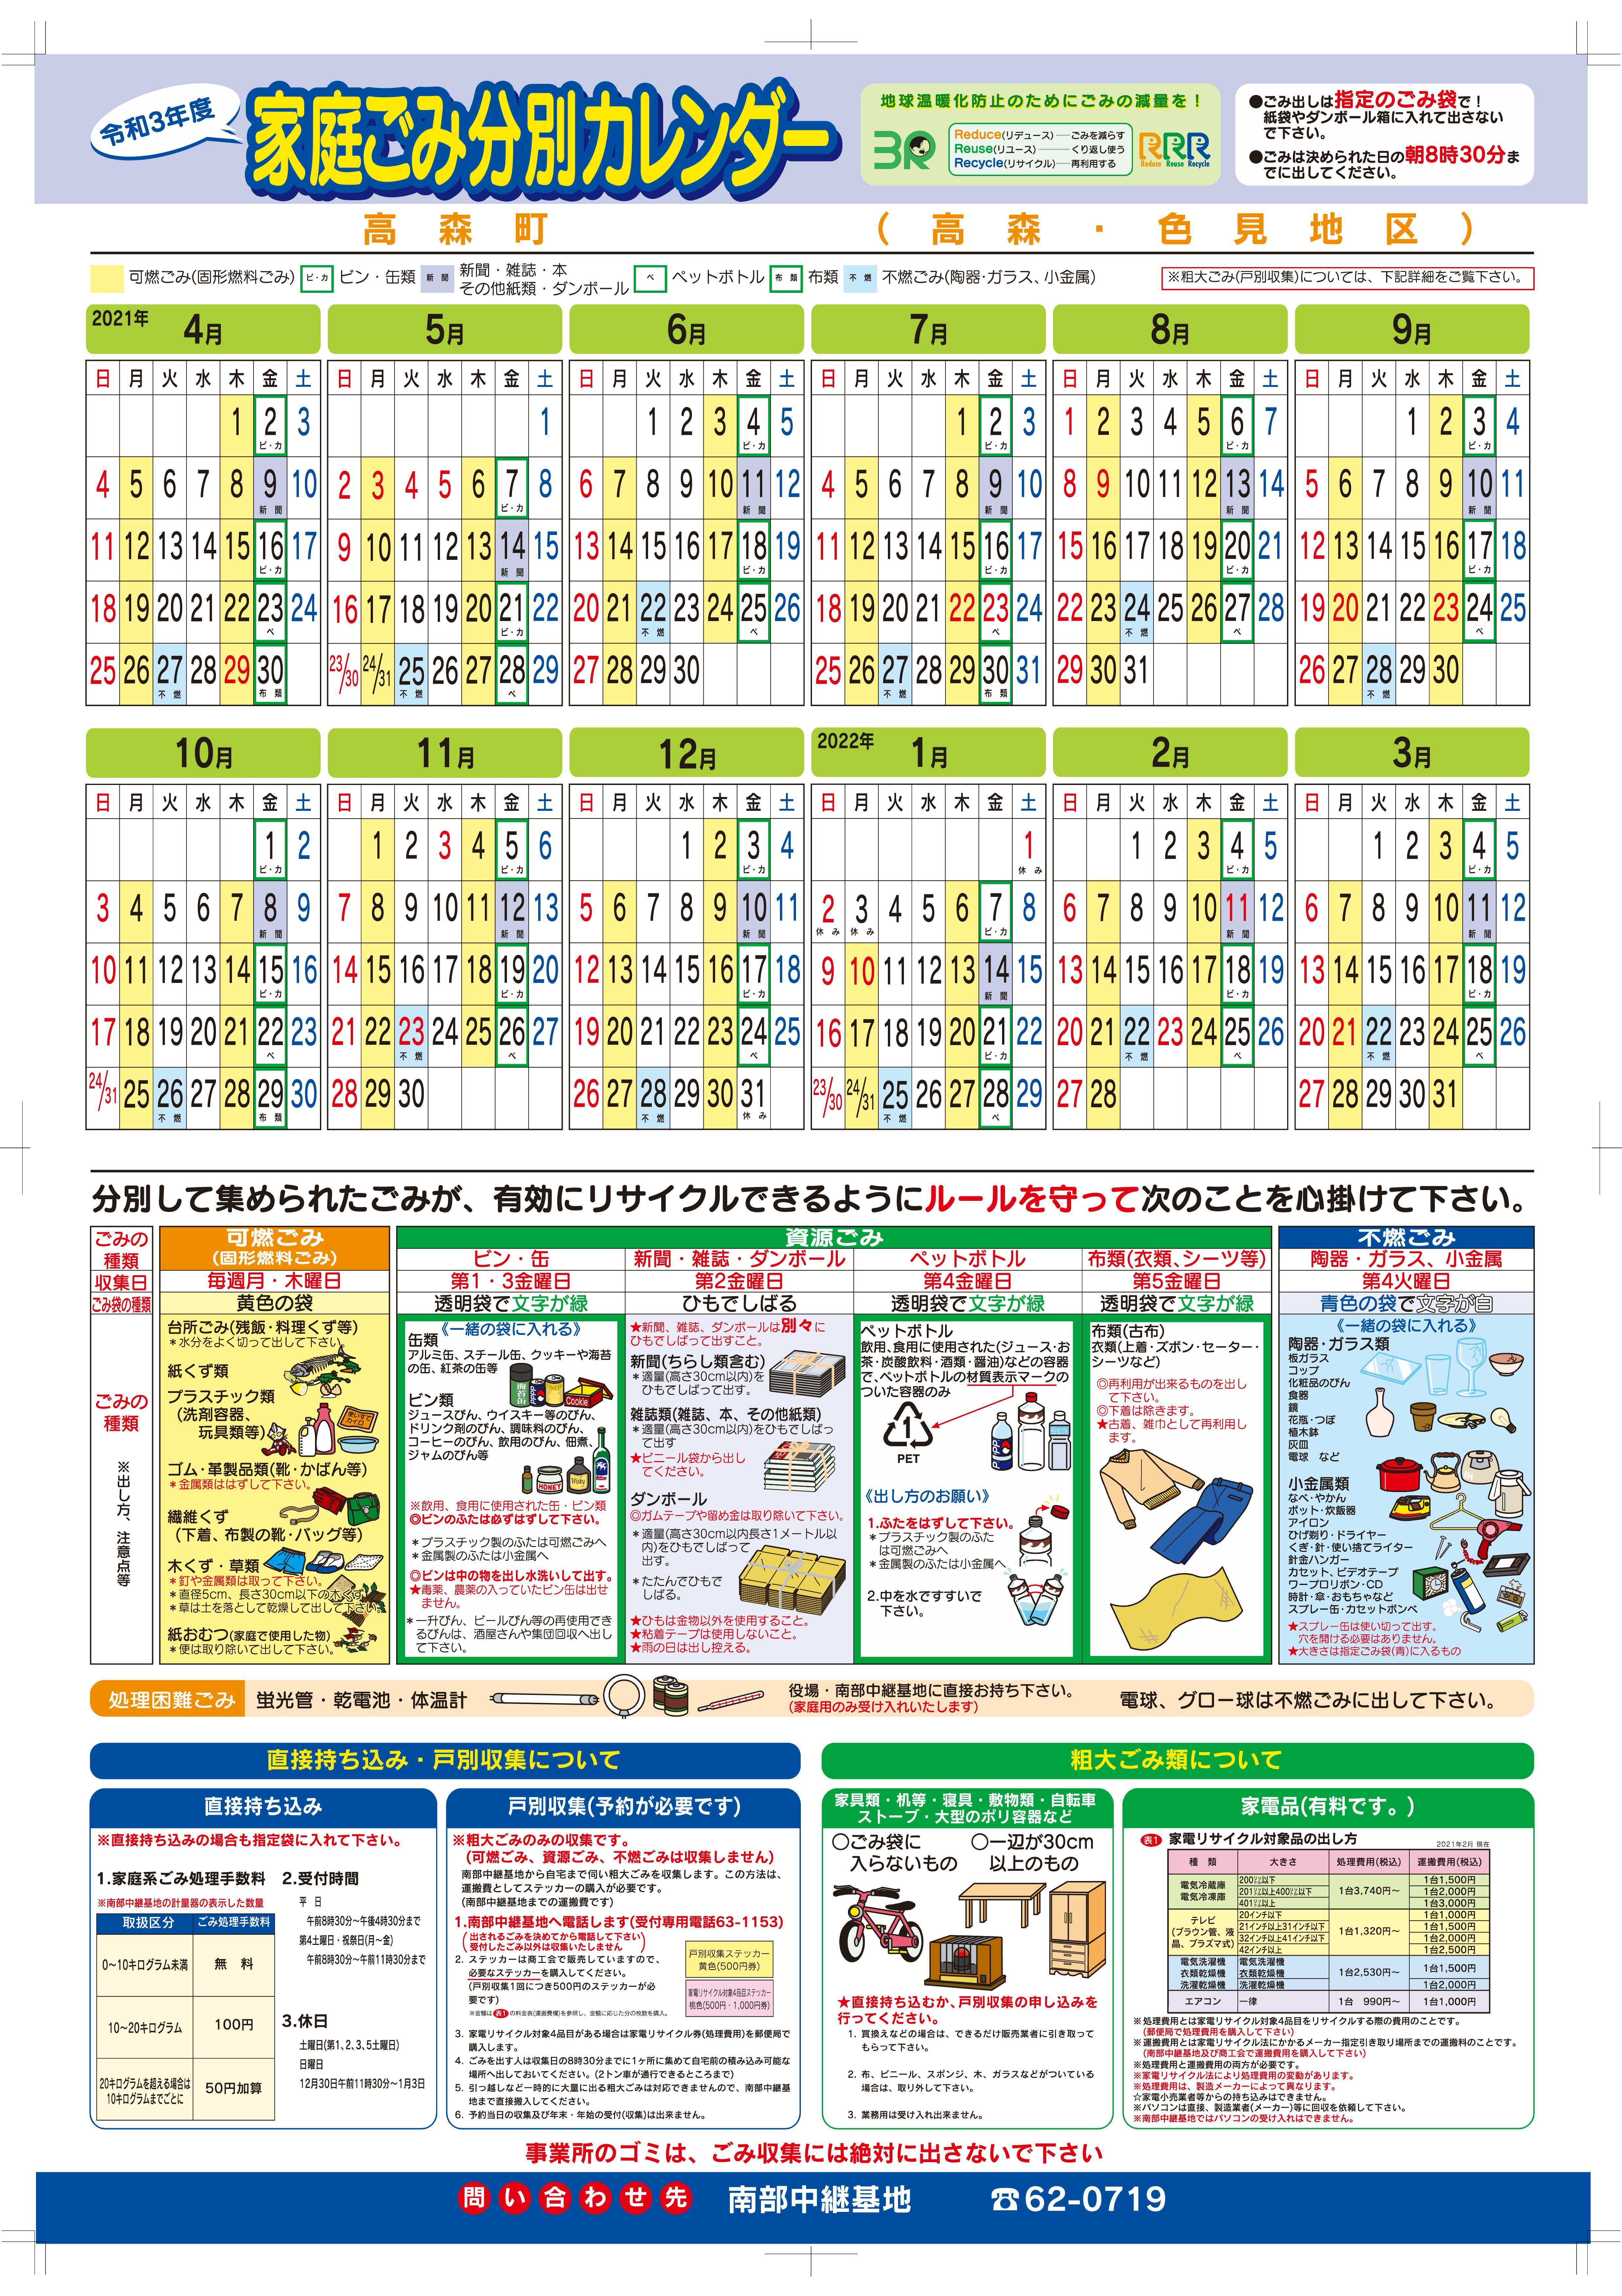 http://www.town.takamori.kumamoto.jp/chosha/somu/upload/efc2650647ebeccb71f4474c25552040d7f01e8a.jpg